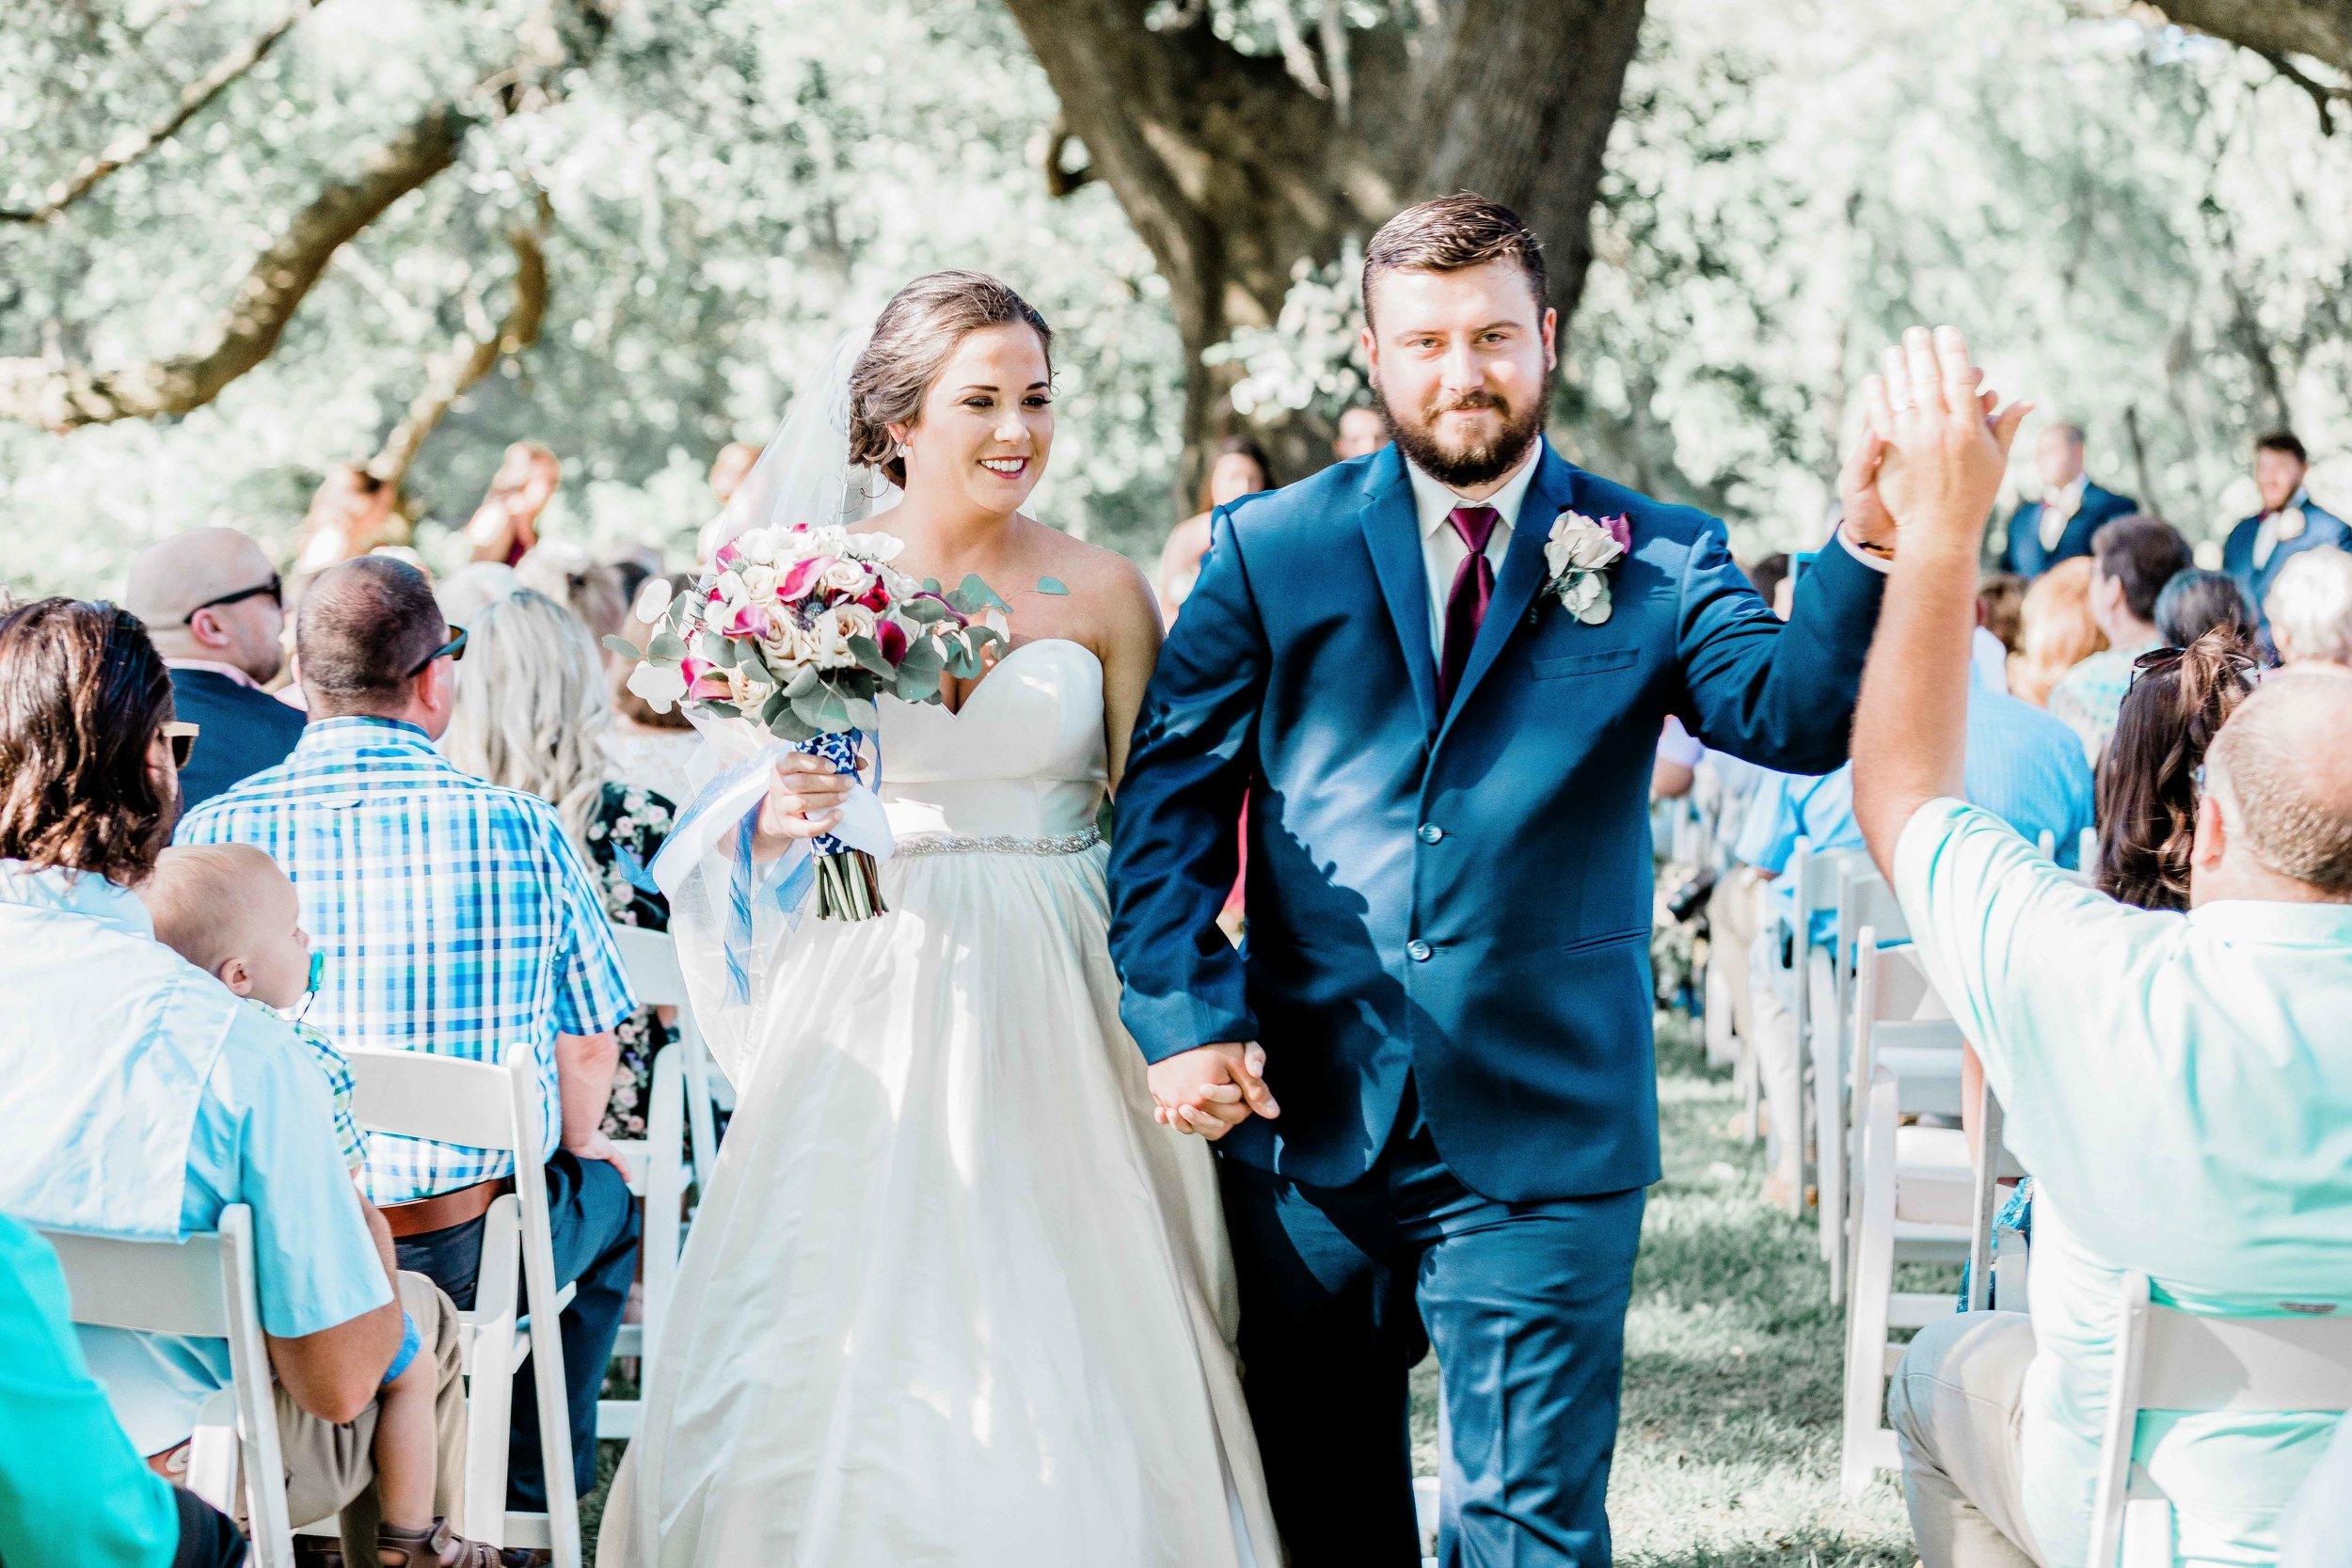 20190427-Southern Lens Photography- Savannah Wedding Photographer-Screven and Caroline-201971.jpg